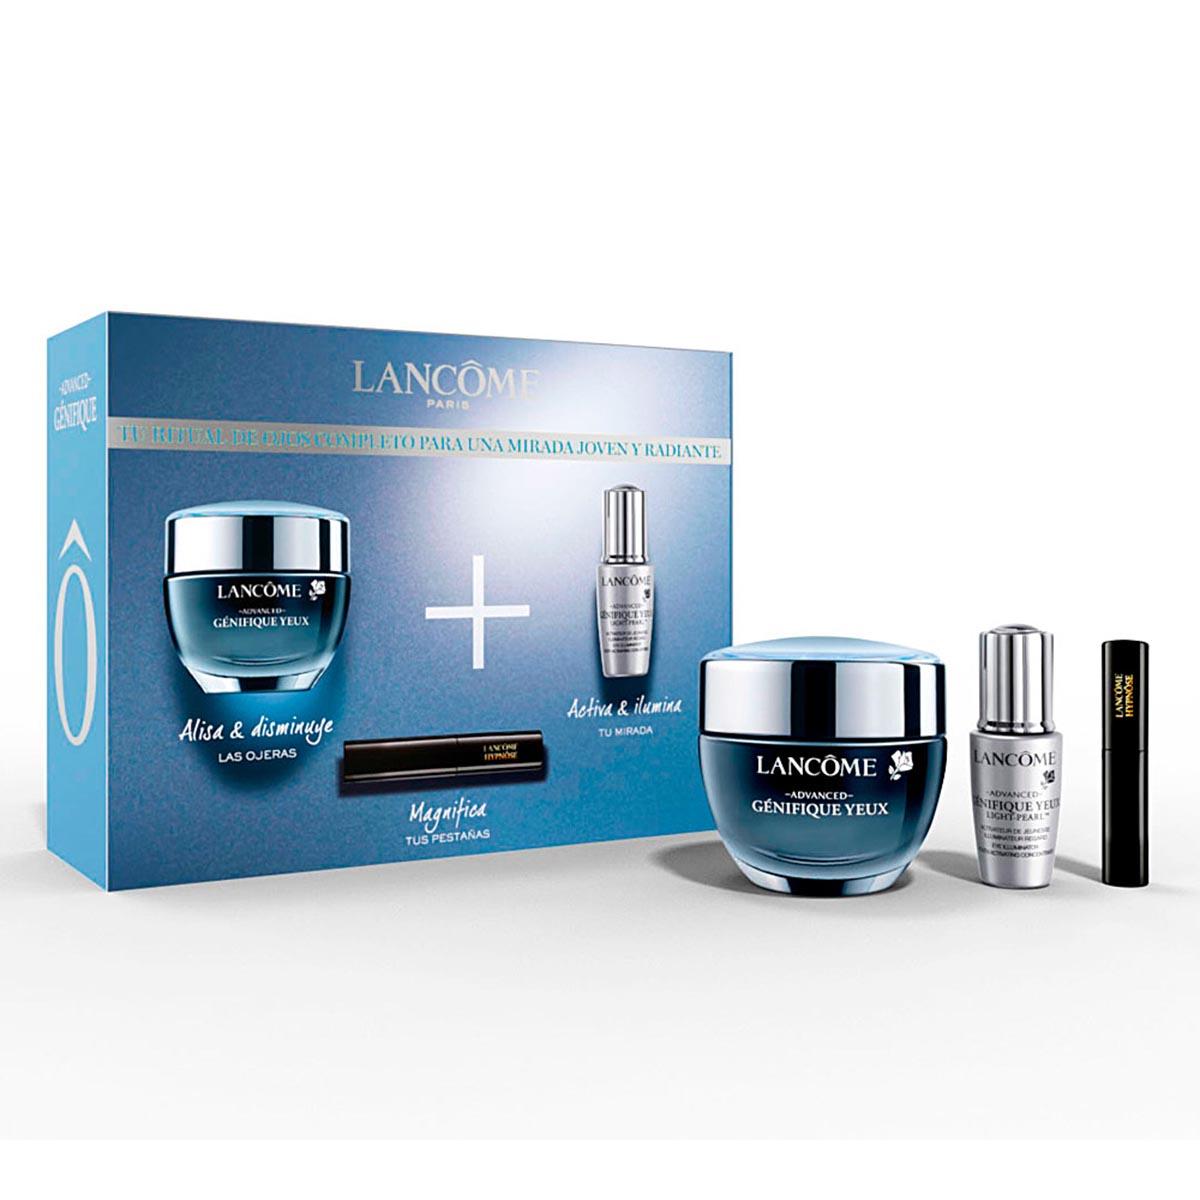 Lancome advanced genifique yeux cream light pearl concentrate mascara